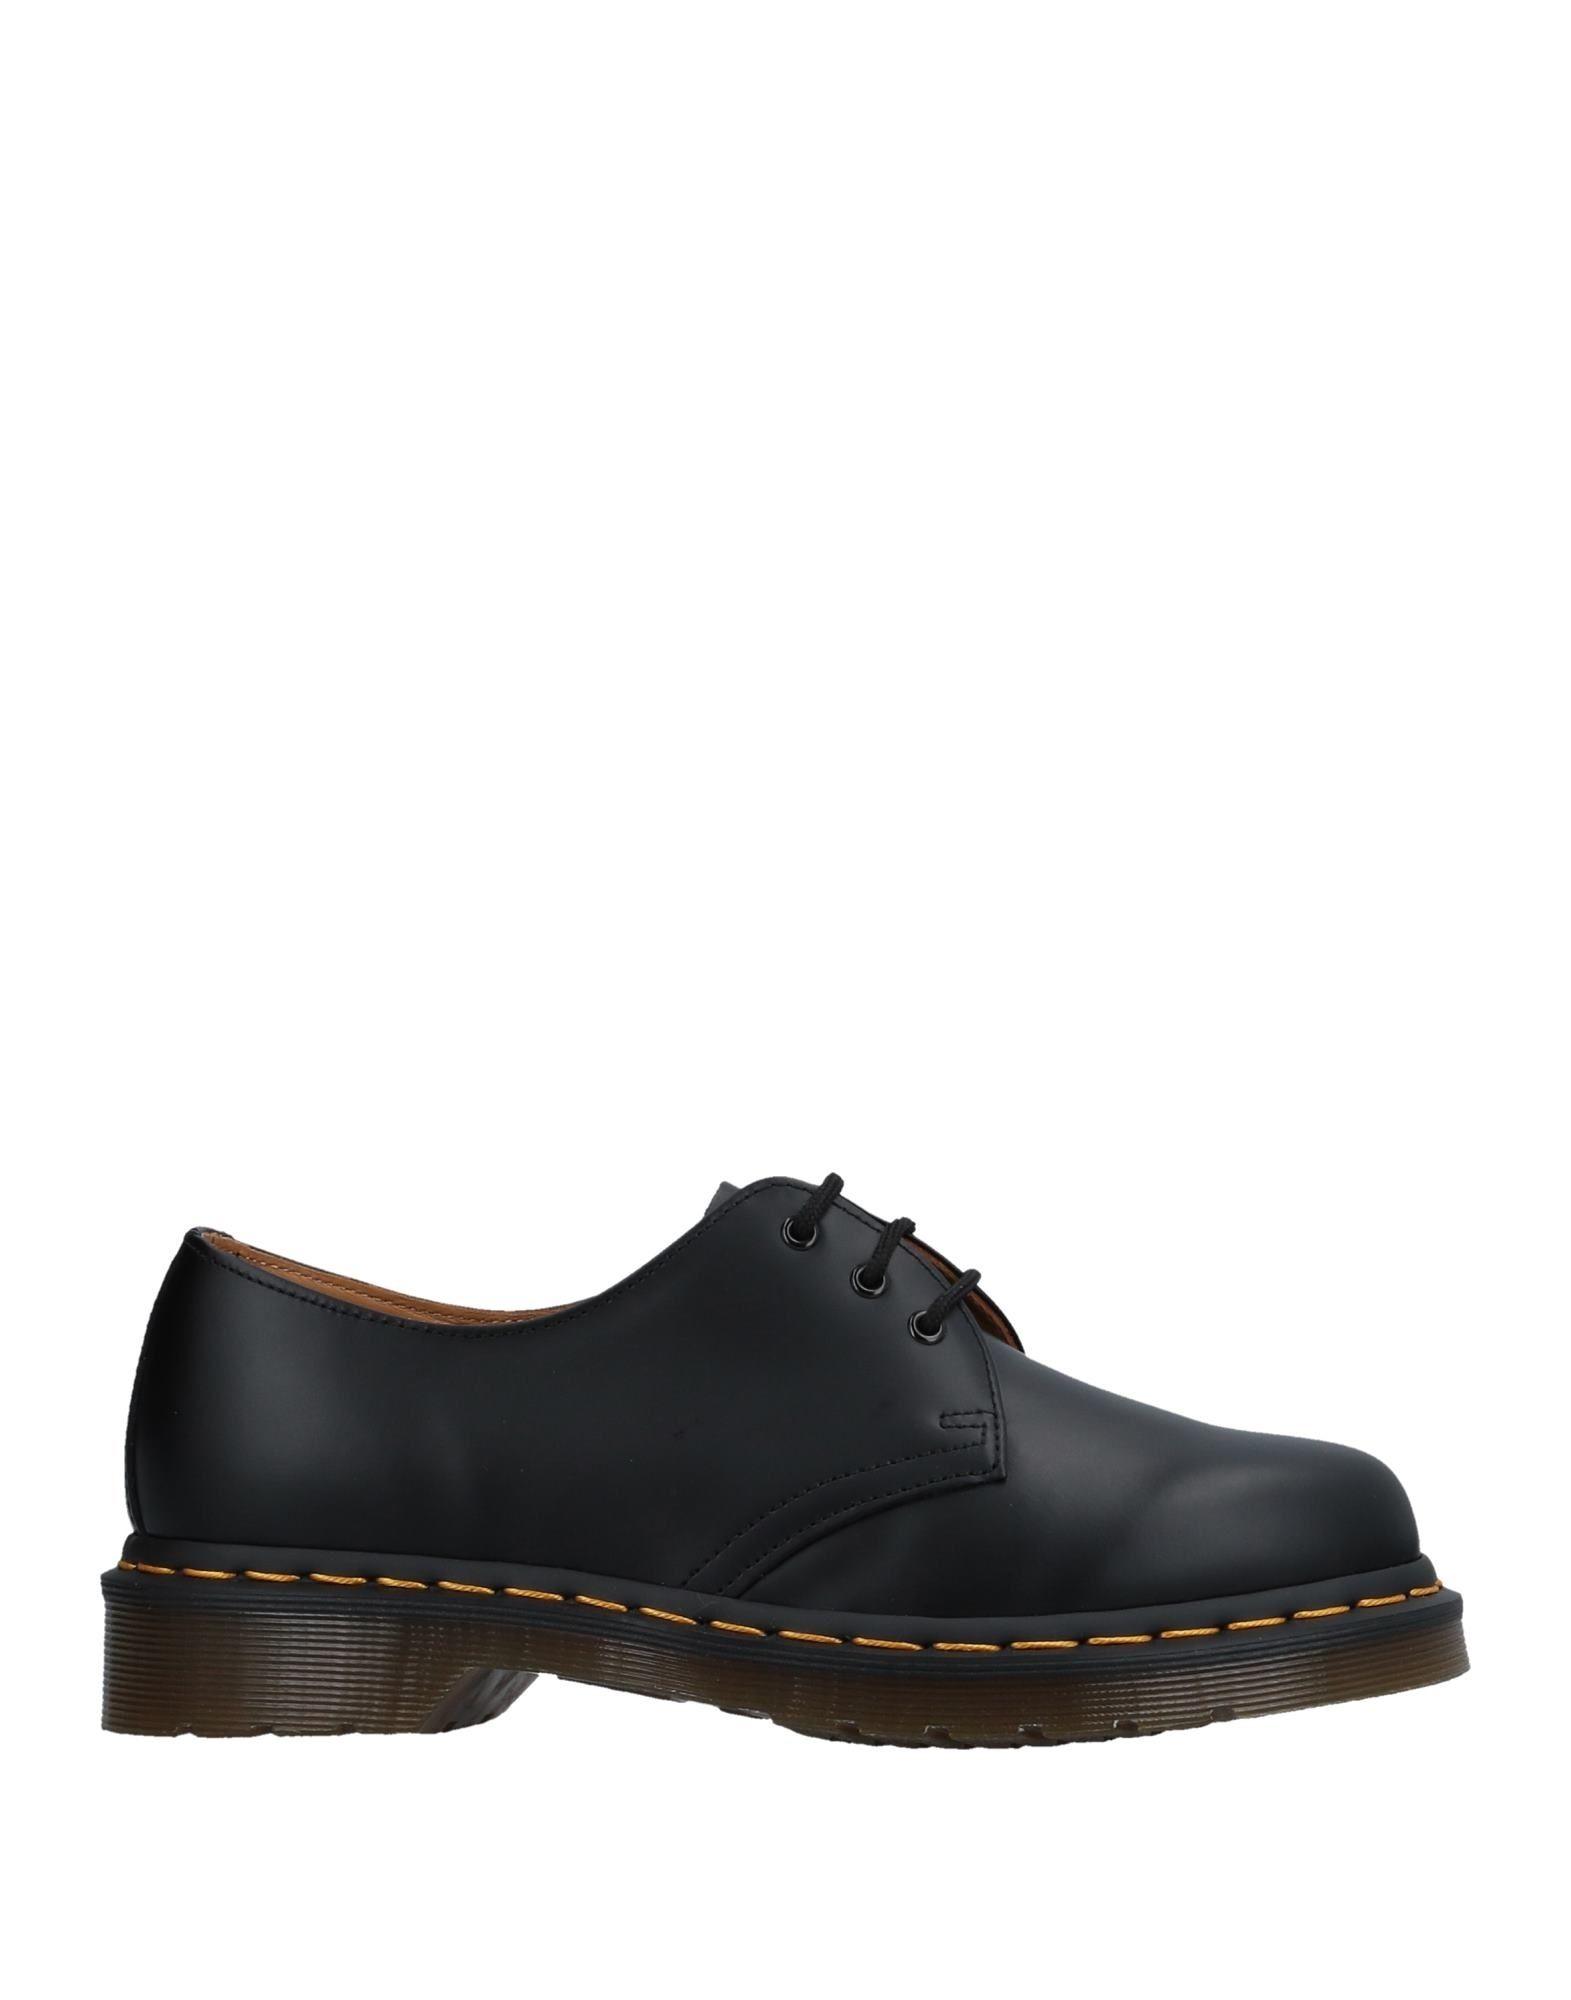 Dr. Martens Schnürschuhe Herren  11507830CN Gute Qualität beliebte Schuhe